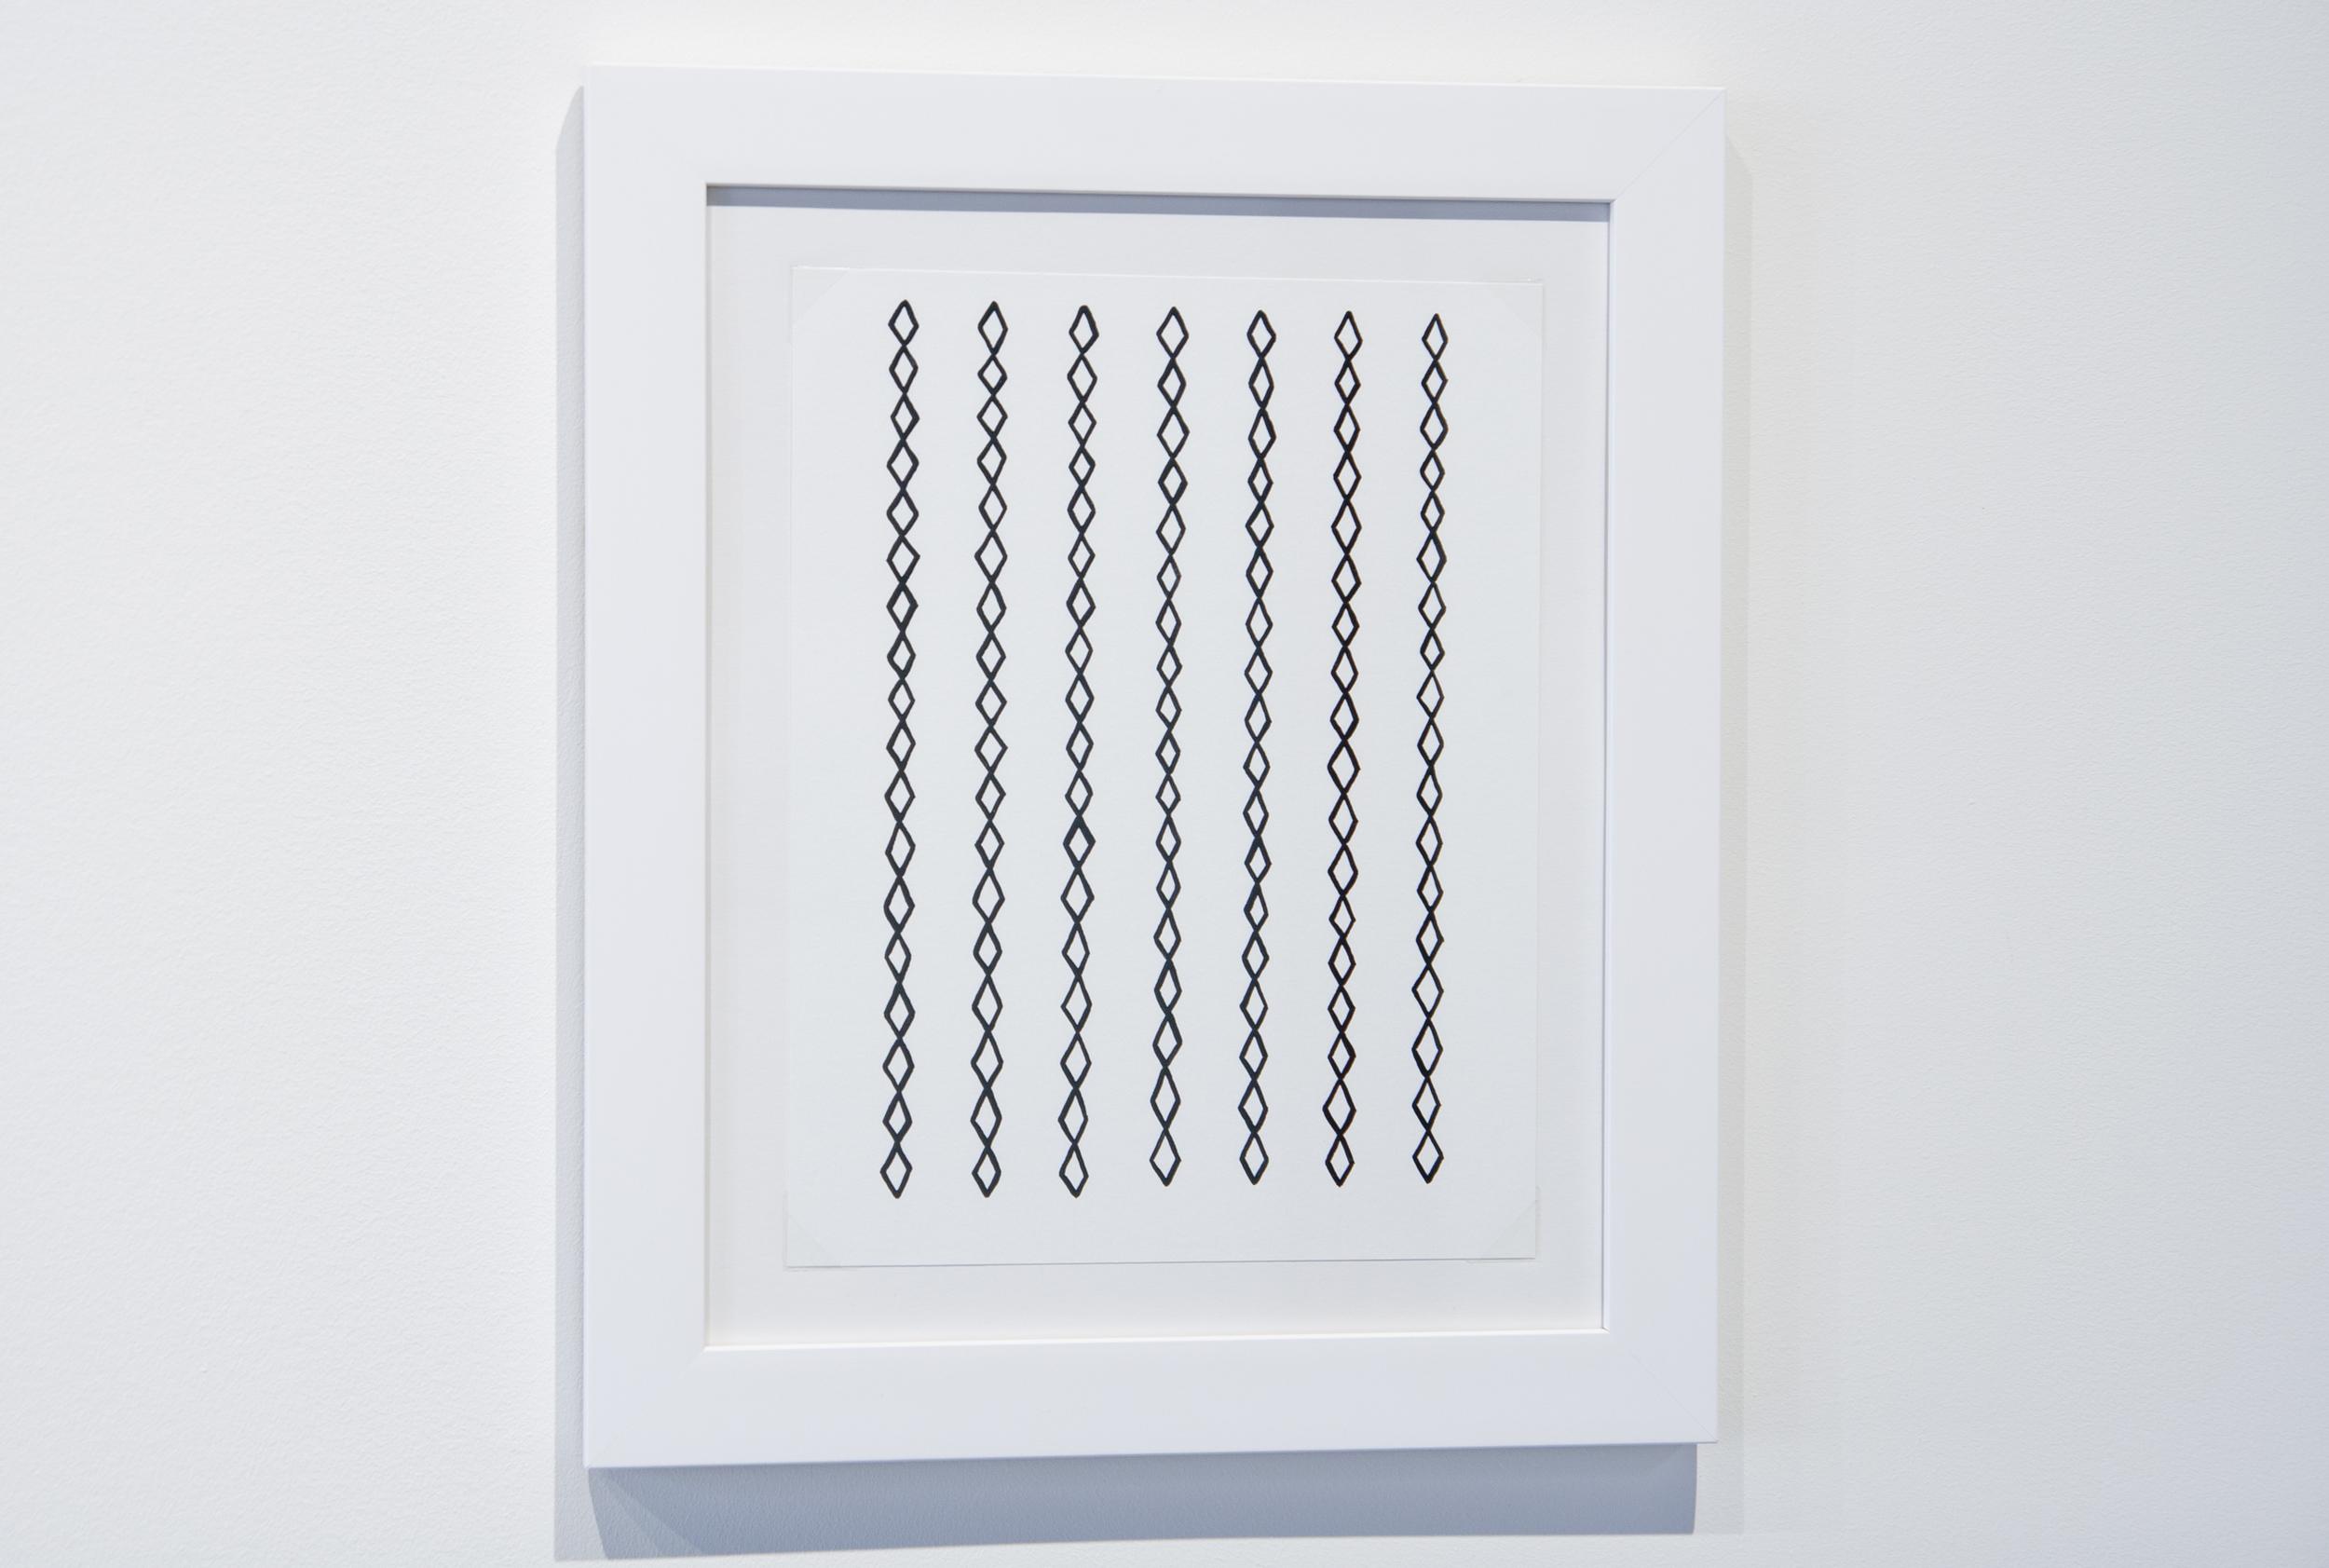 Small Diamonds,  2015,acryla-gouache on paper,28 x 21.5 cm (11 x 8.5 in)